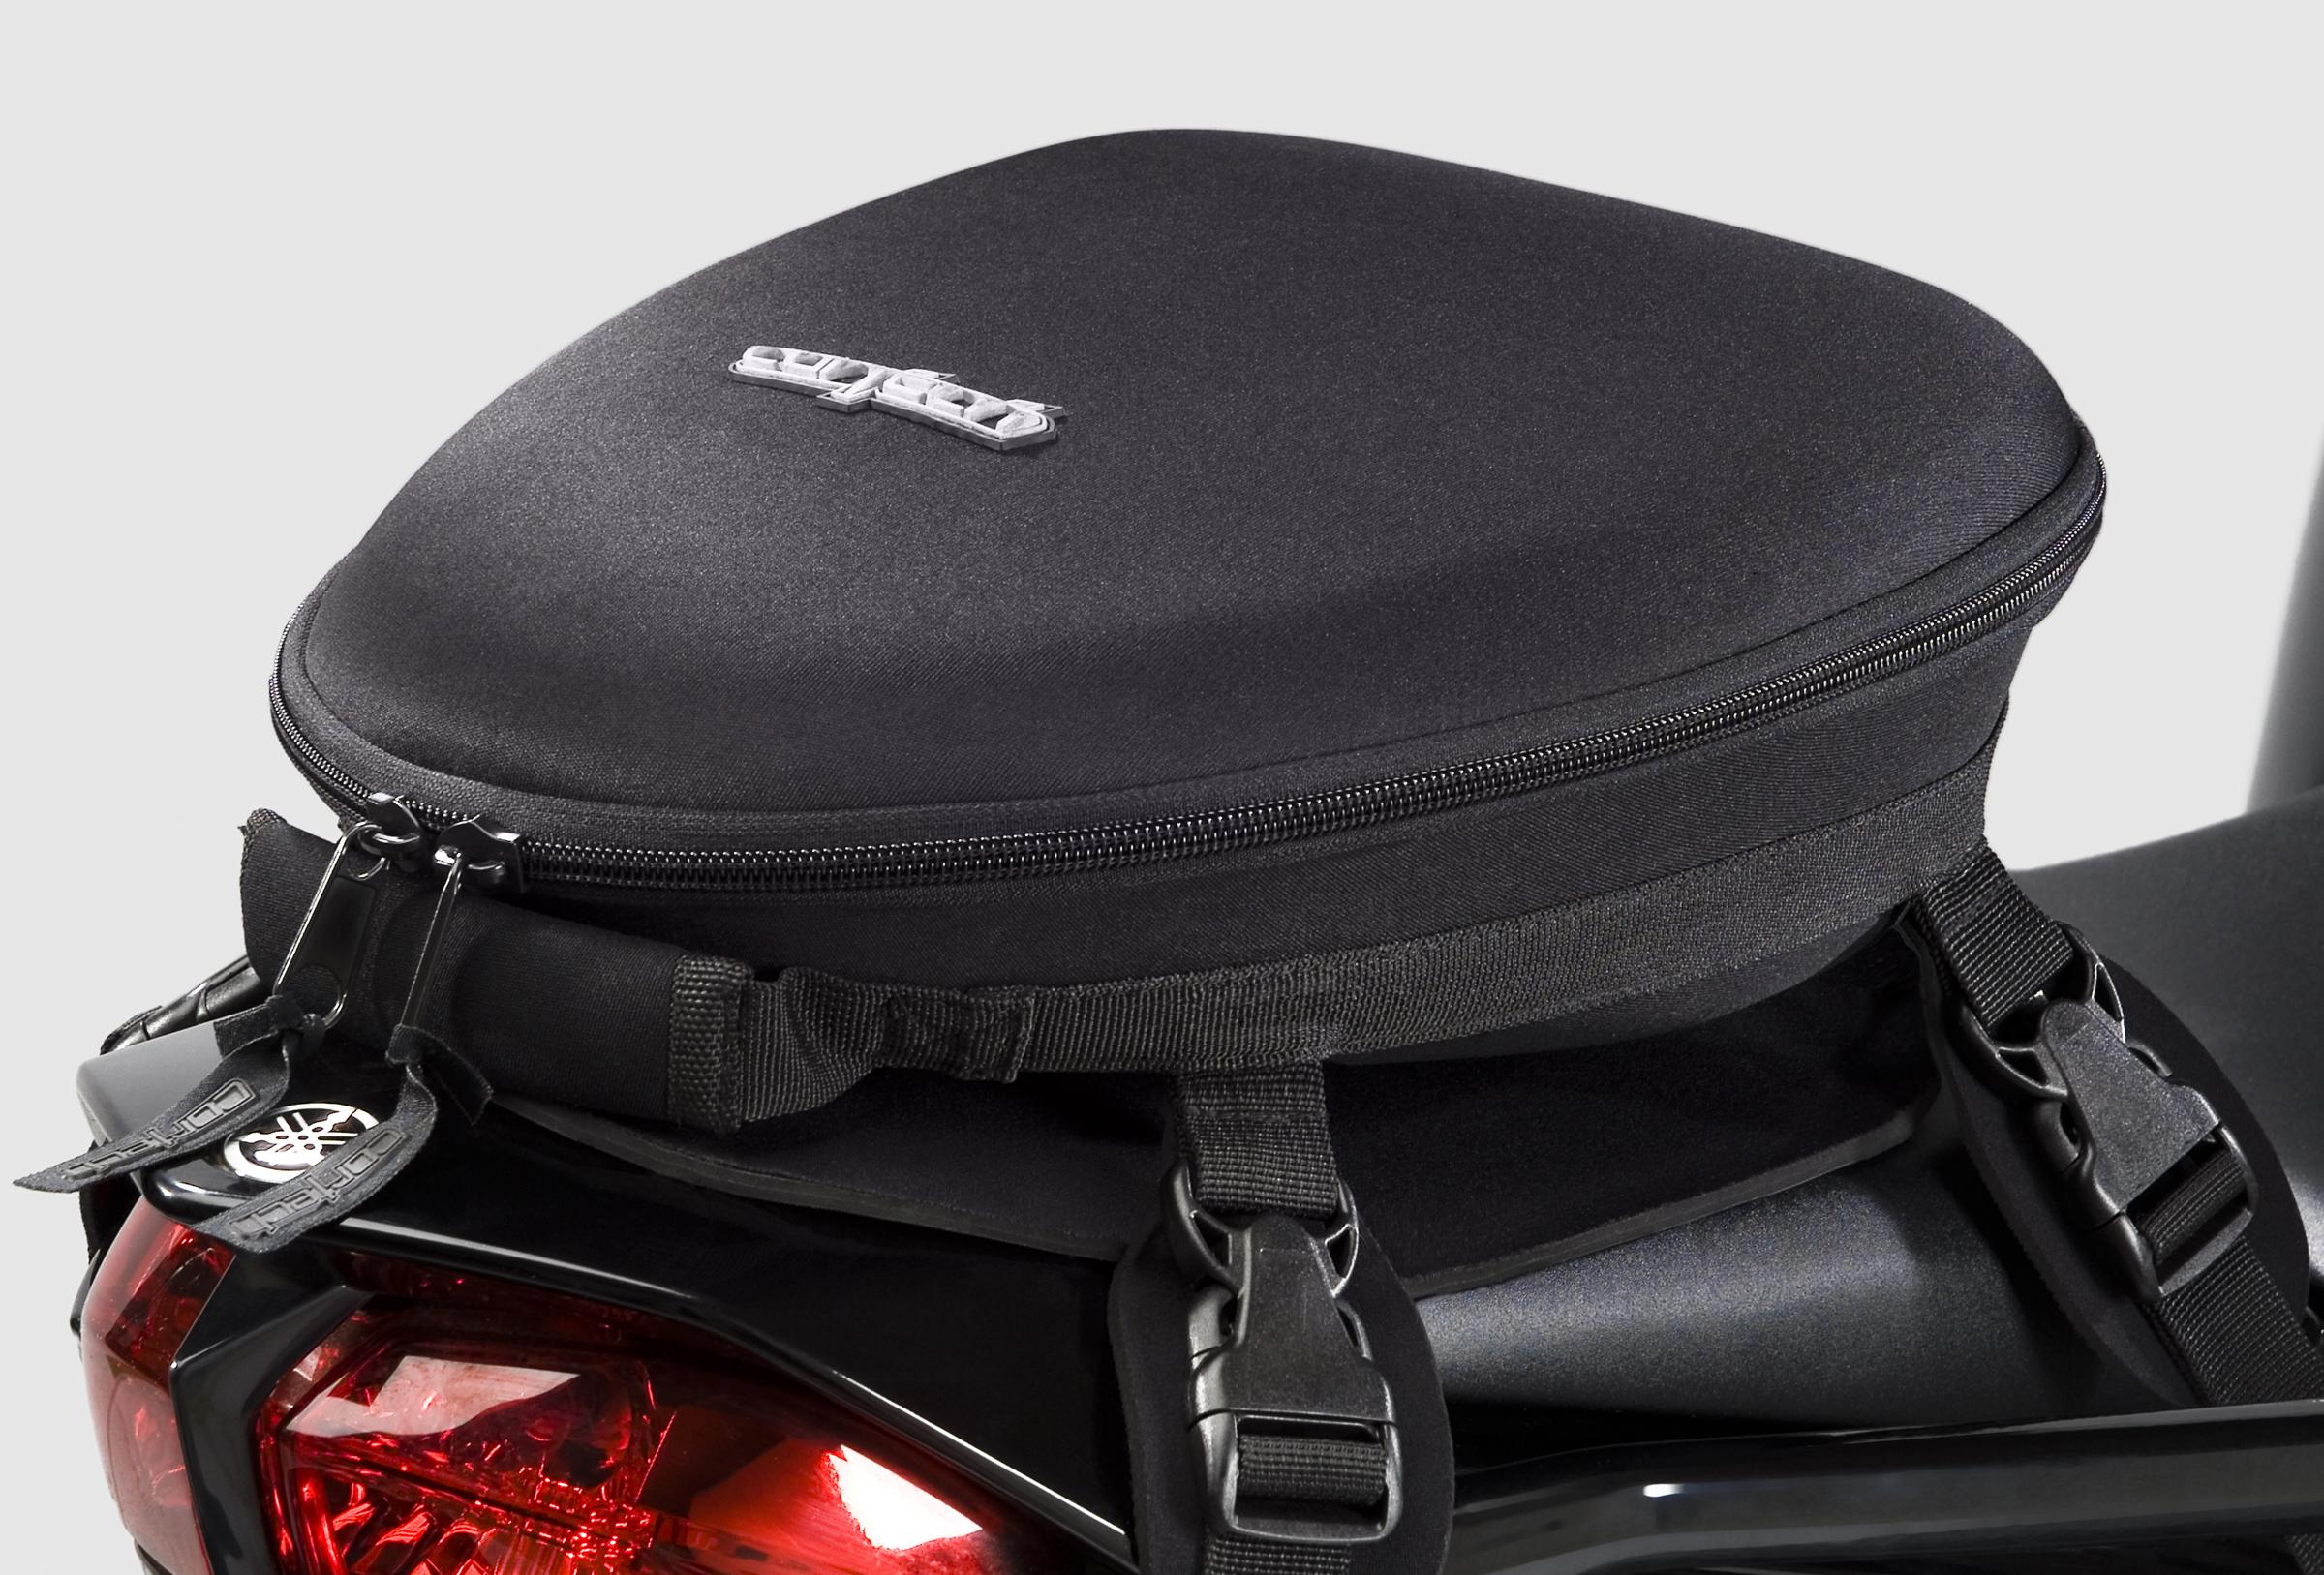 Dryver Tail Bag